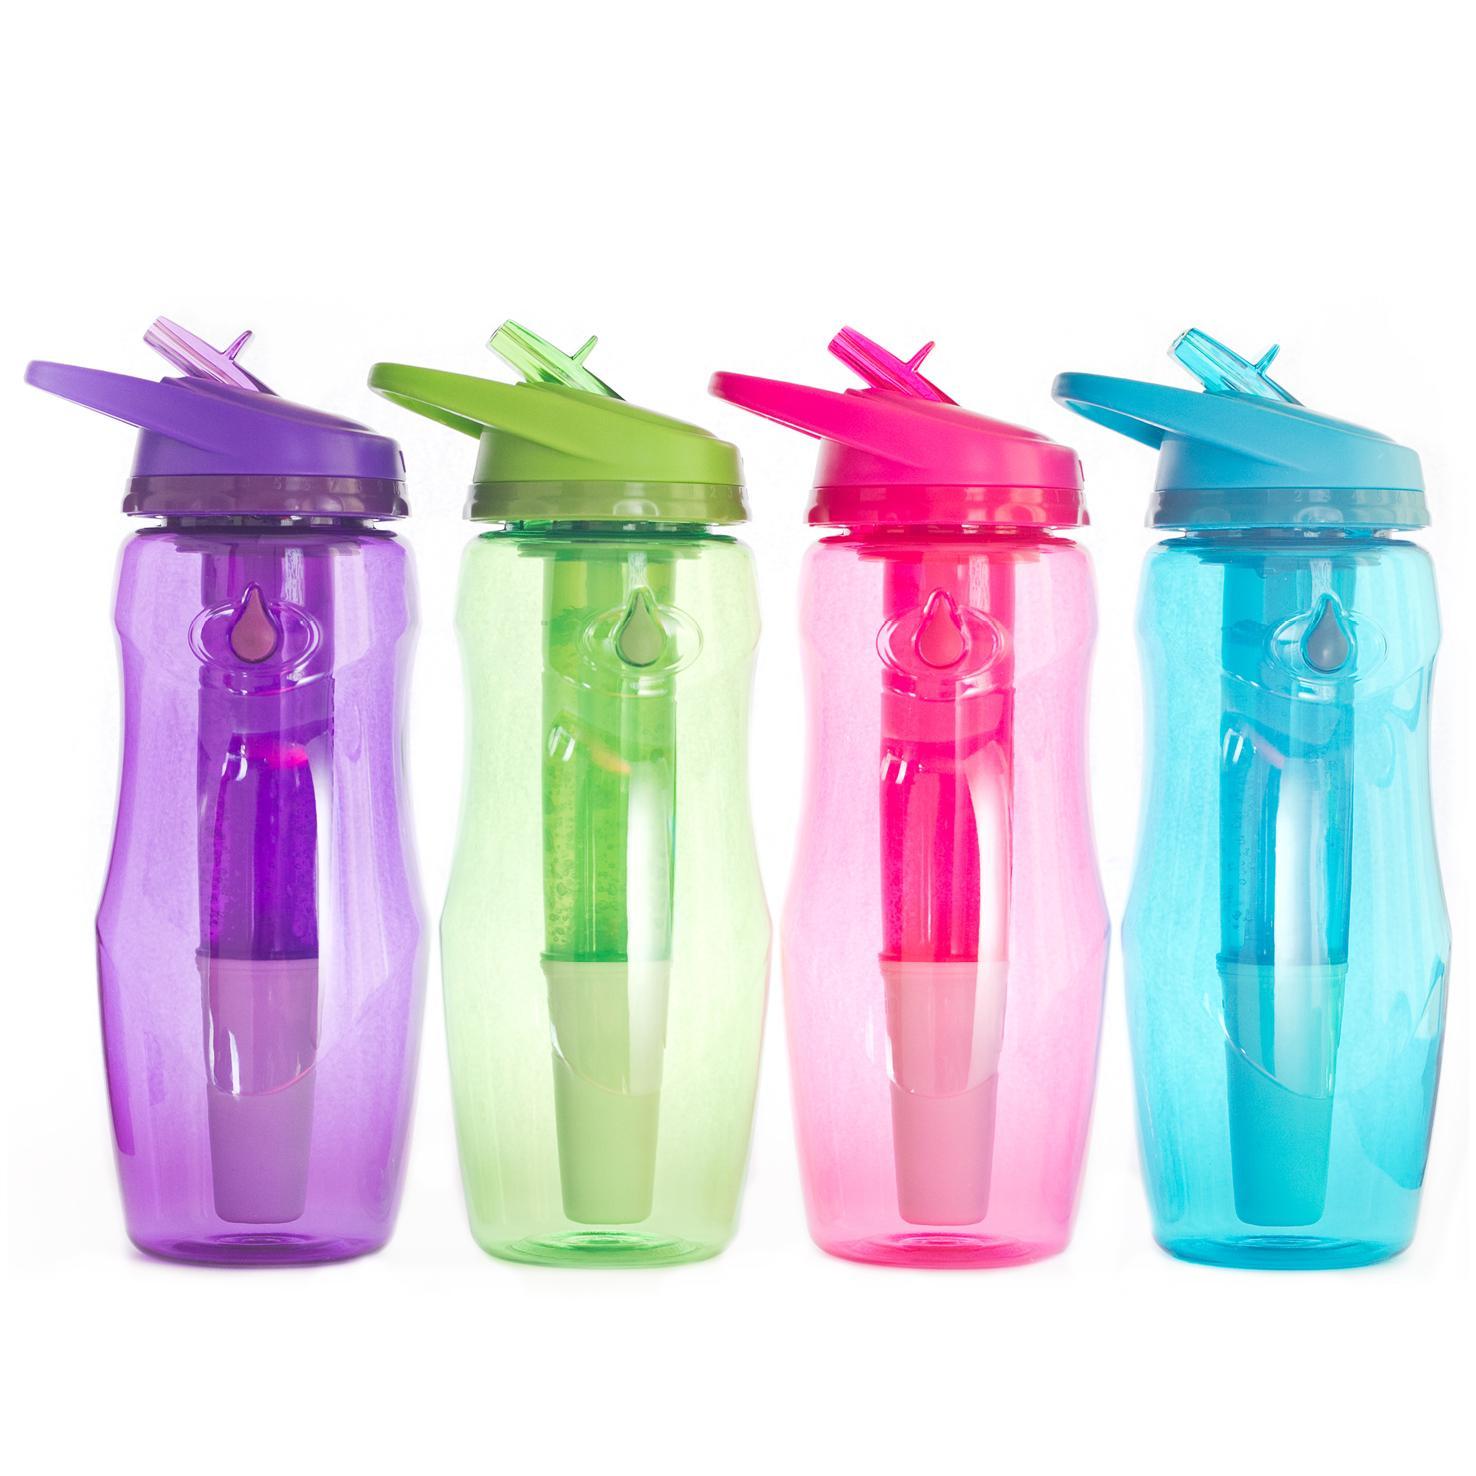 BBO botellas Irisana filtra enfría agua fresca limpia filtro carbono titán